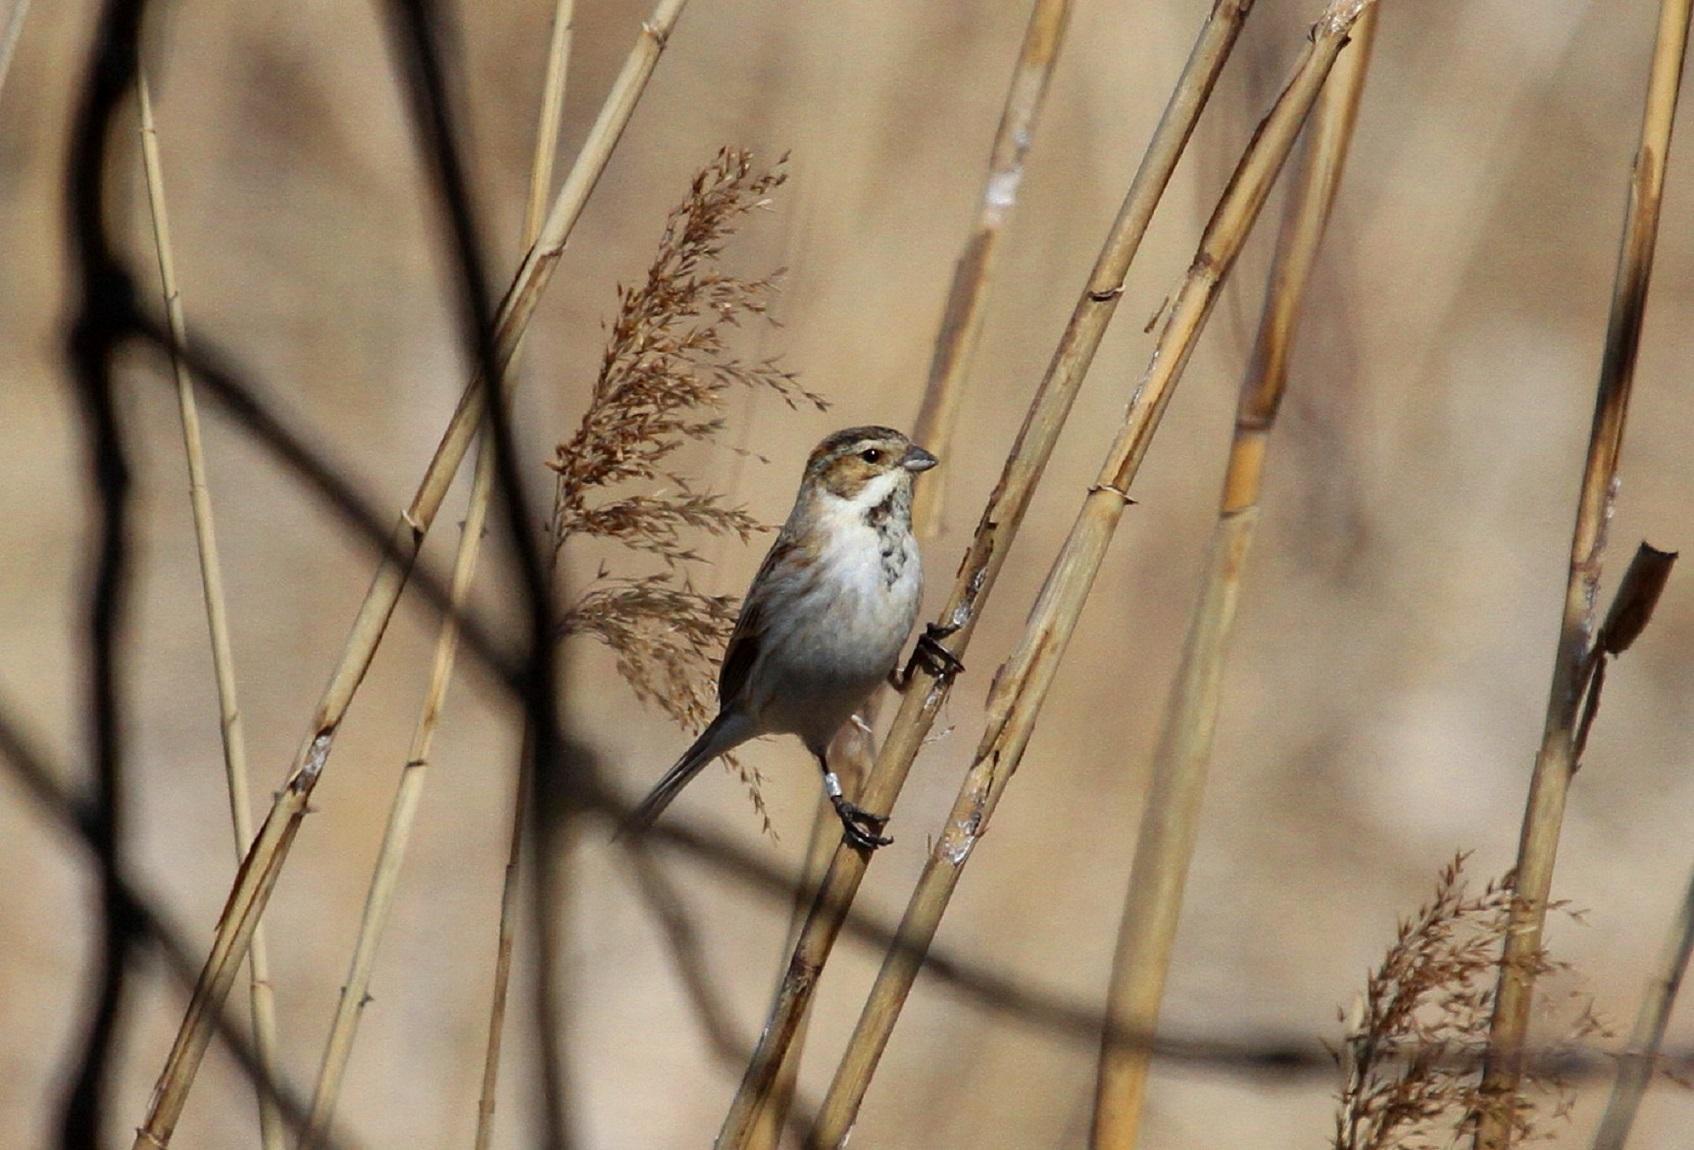 MFで出会えた、冬鳥オオジュリン冬羽から夏羽に変わりつつ_f0239515_215822.jpg